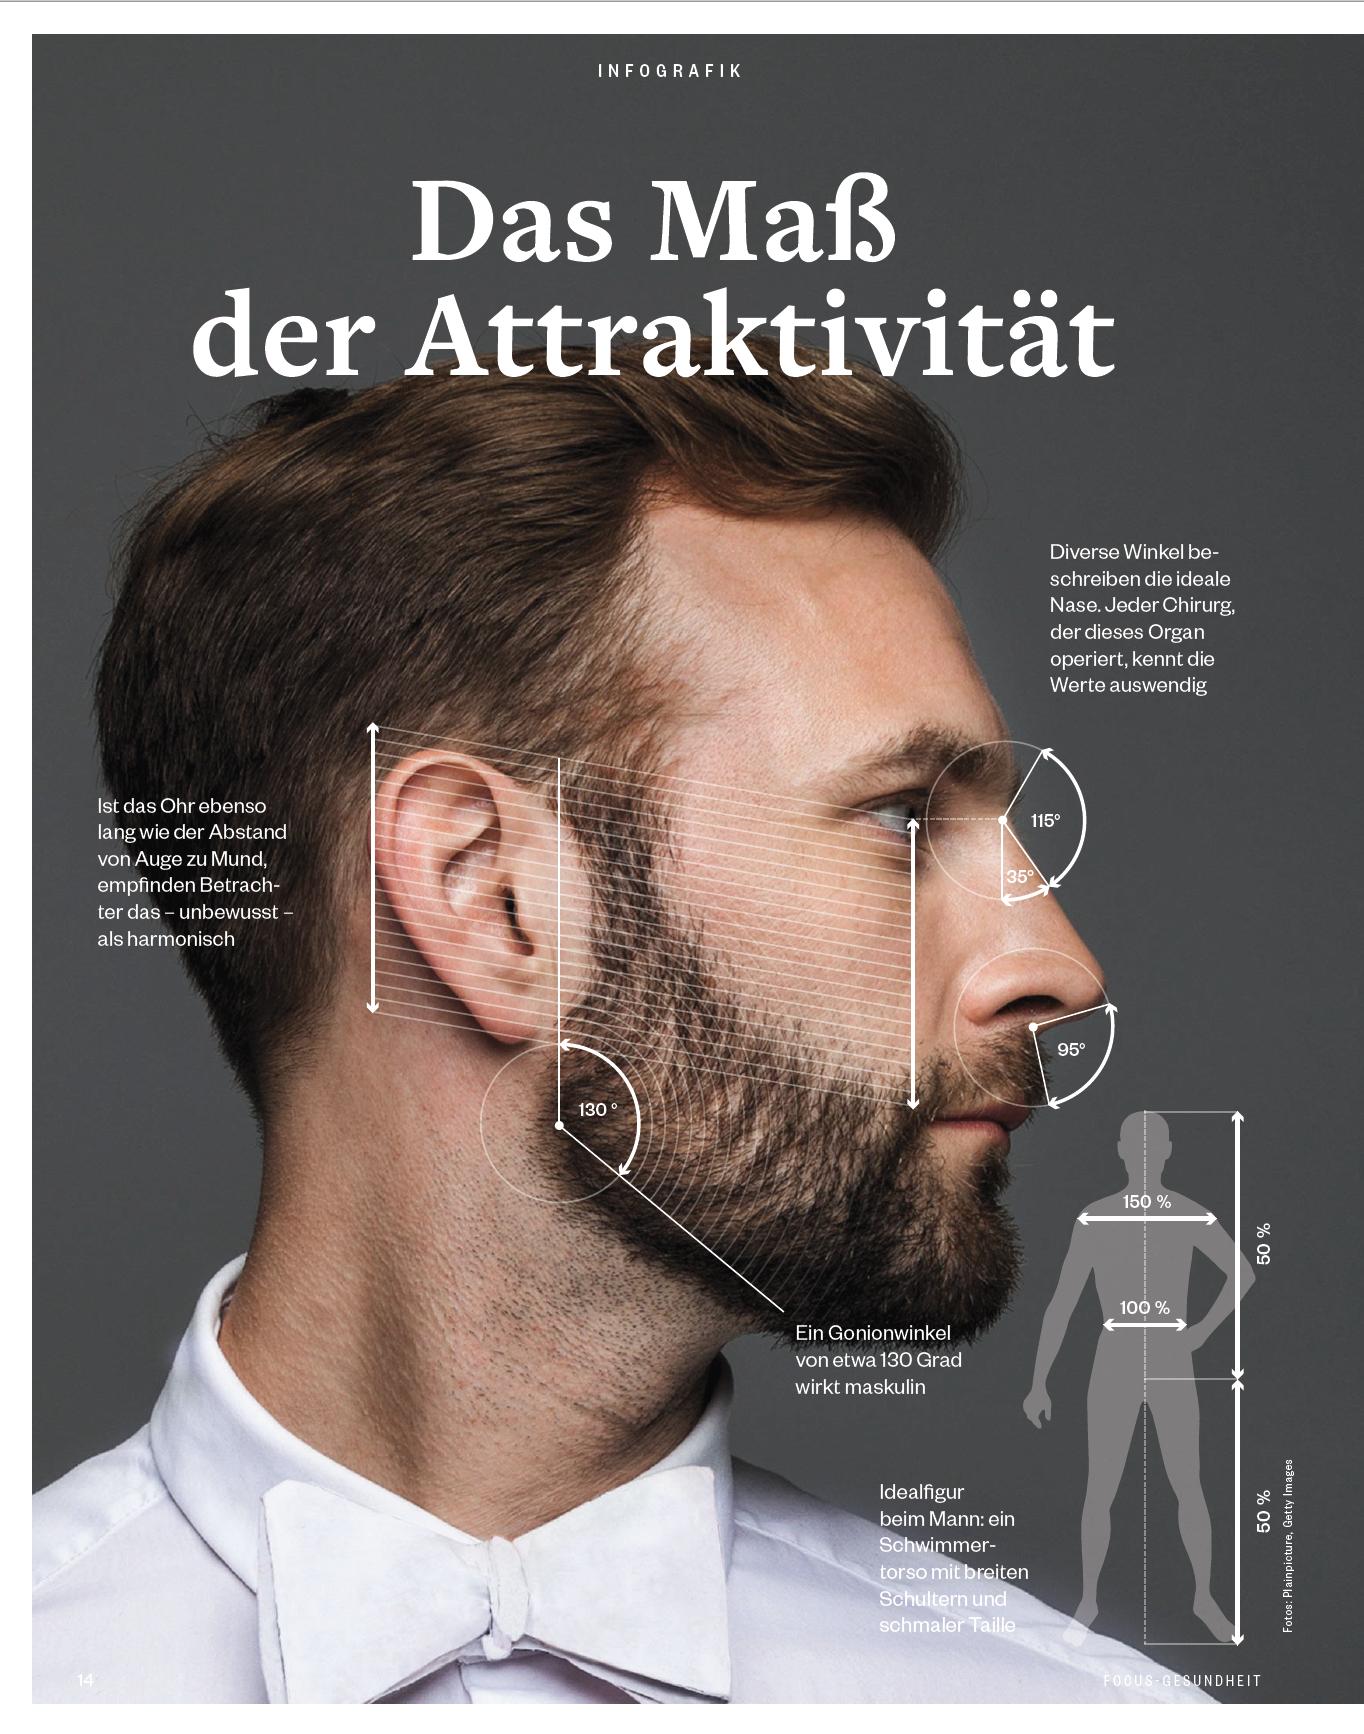 FOCUS-GESUNDHEIT FOCUS Gesundheit - Gesunde Haut & Zähne